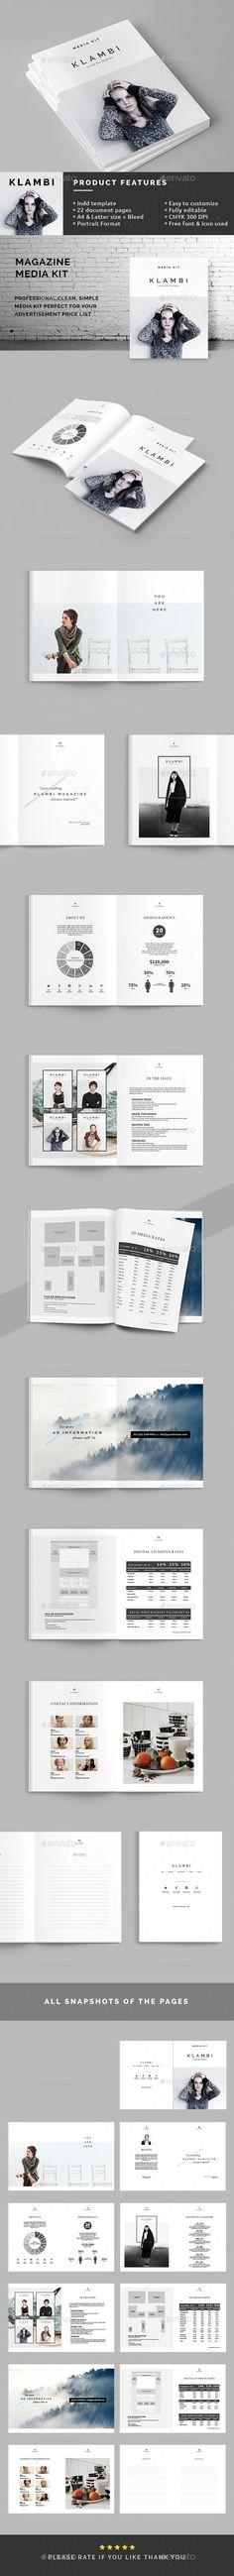 Professional, Fresh and Clean Magazine Media Kit Template InDesign INDD #design Download: http://graphicriver.net/item/magazine-media-kit/14011538?ref=ksioks